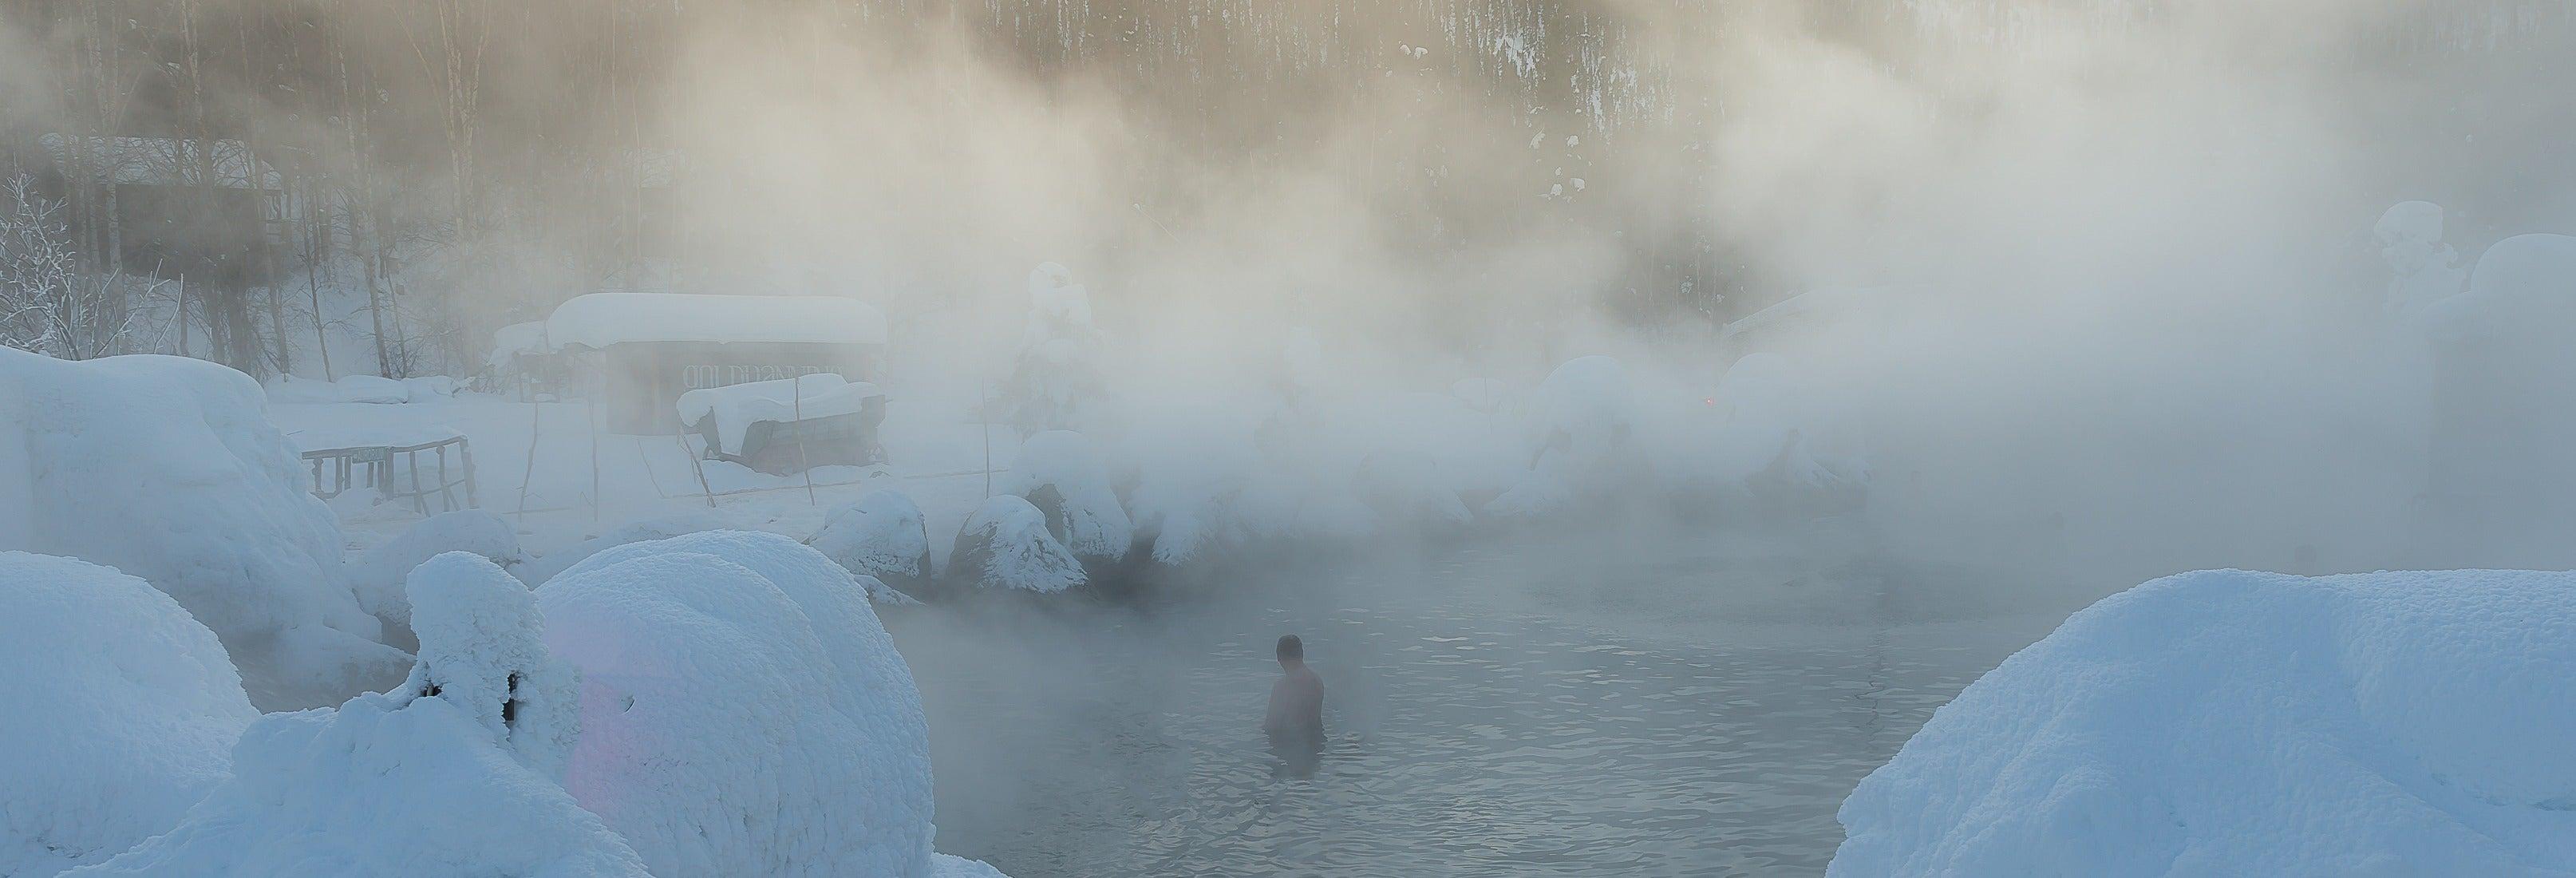 Chena Hot Springs Tour